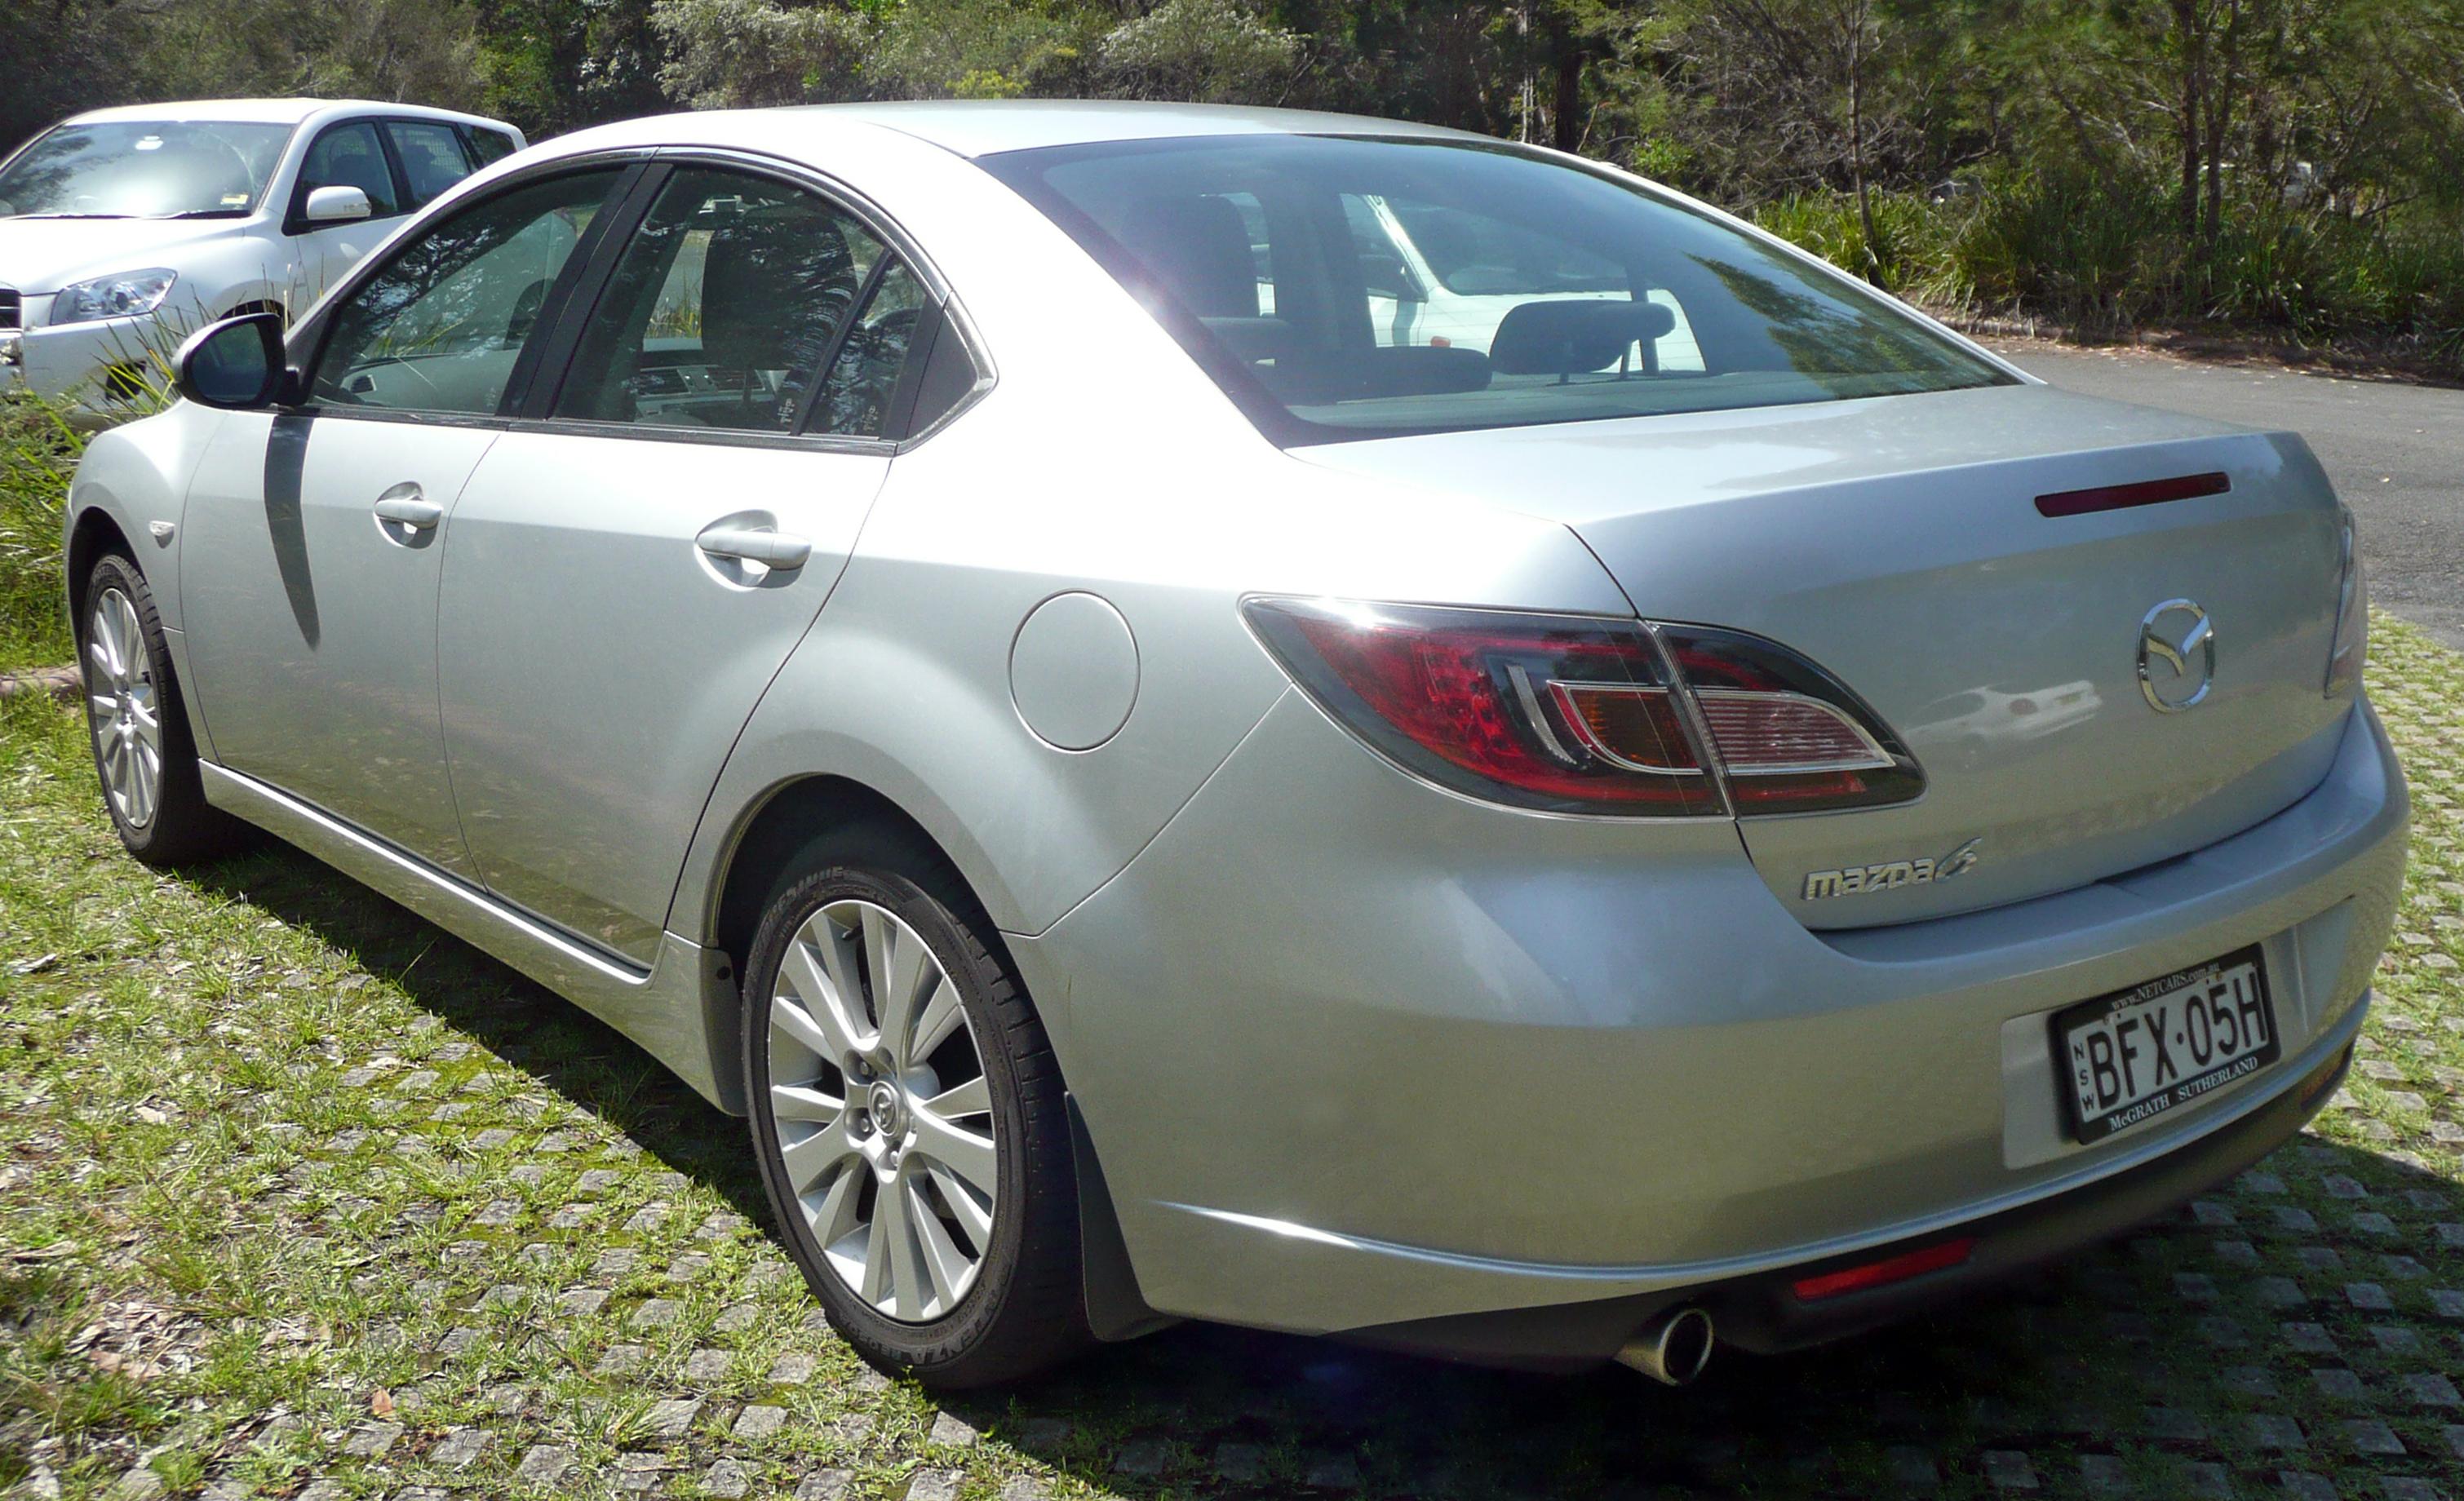 https://upload.wikimedia.org/wikipedia/commons/c/c3/2008_Mazda6_%28GH%29_Classic_sedan_%282009-11-12%29_01.jpg